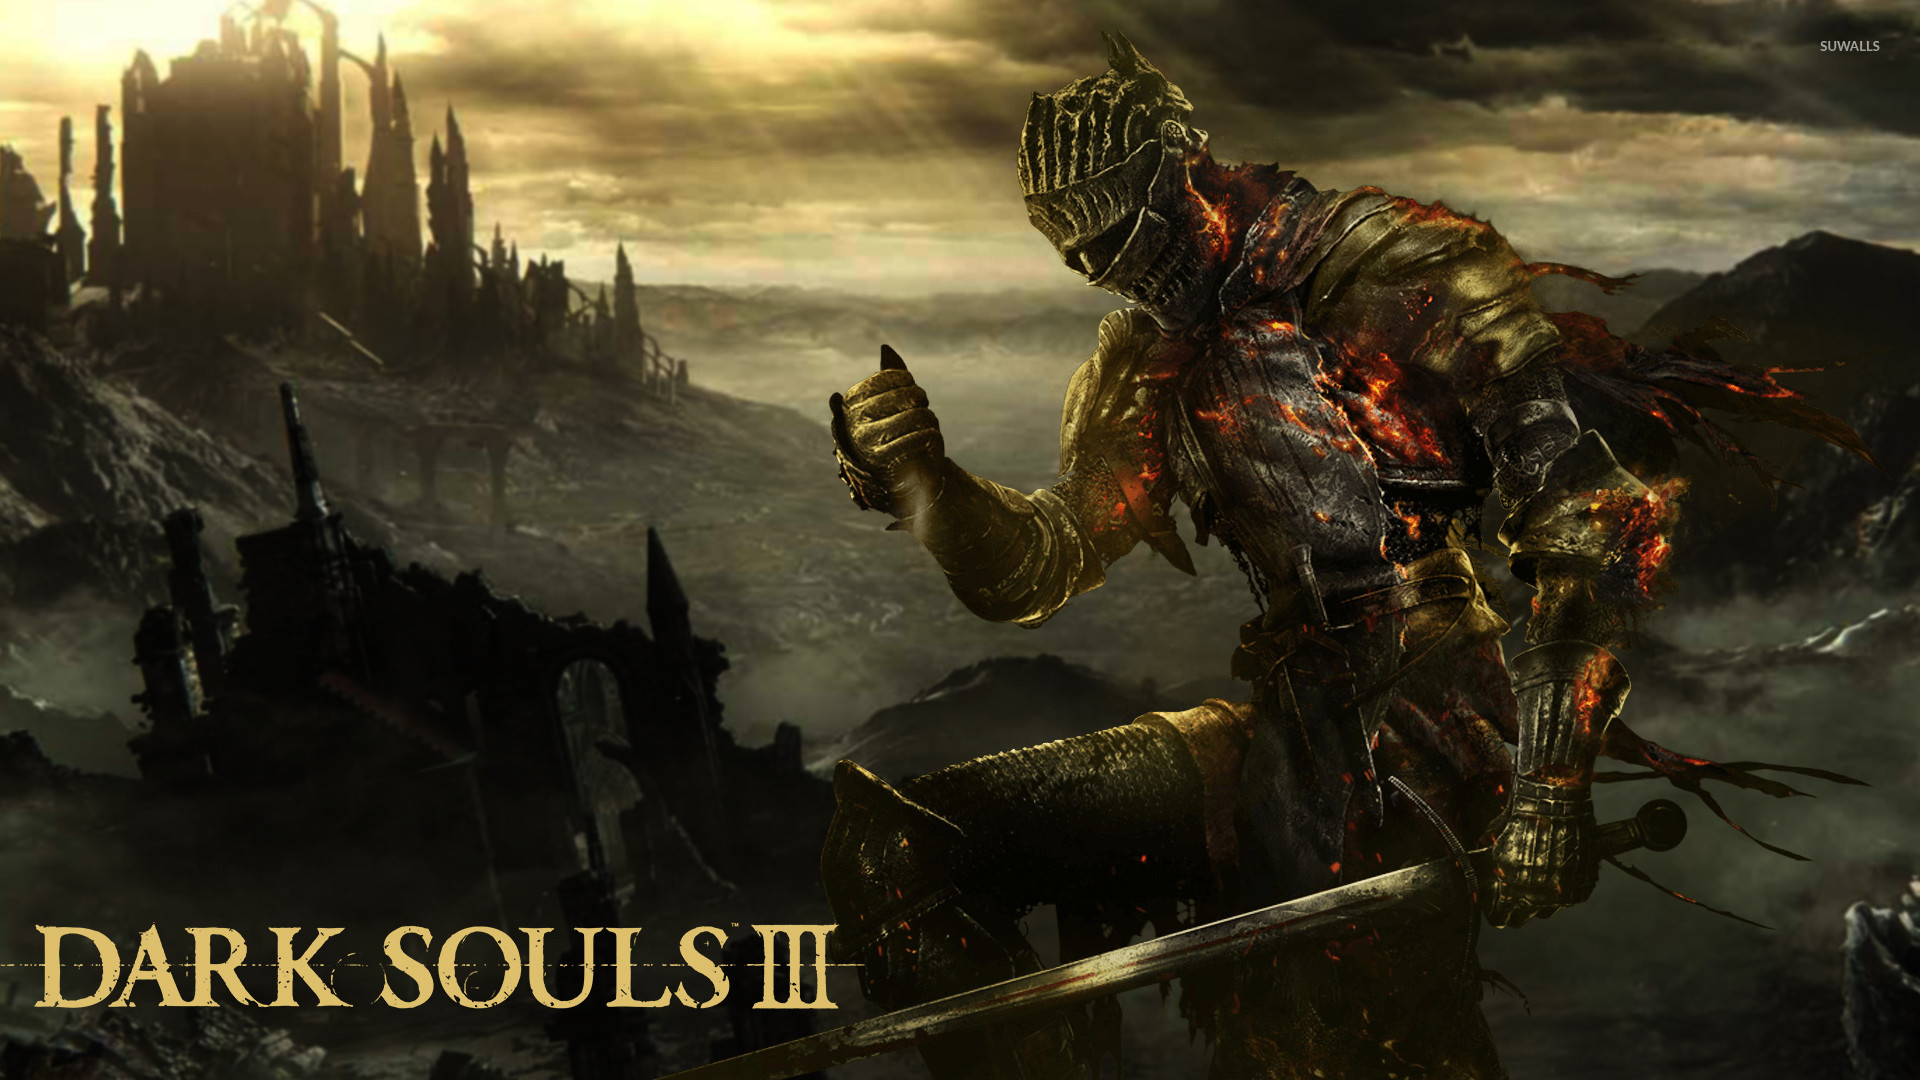 Flaming knight in Dark Souls III wallpaper jpg